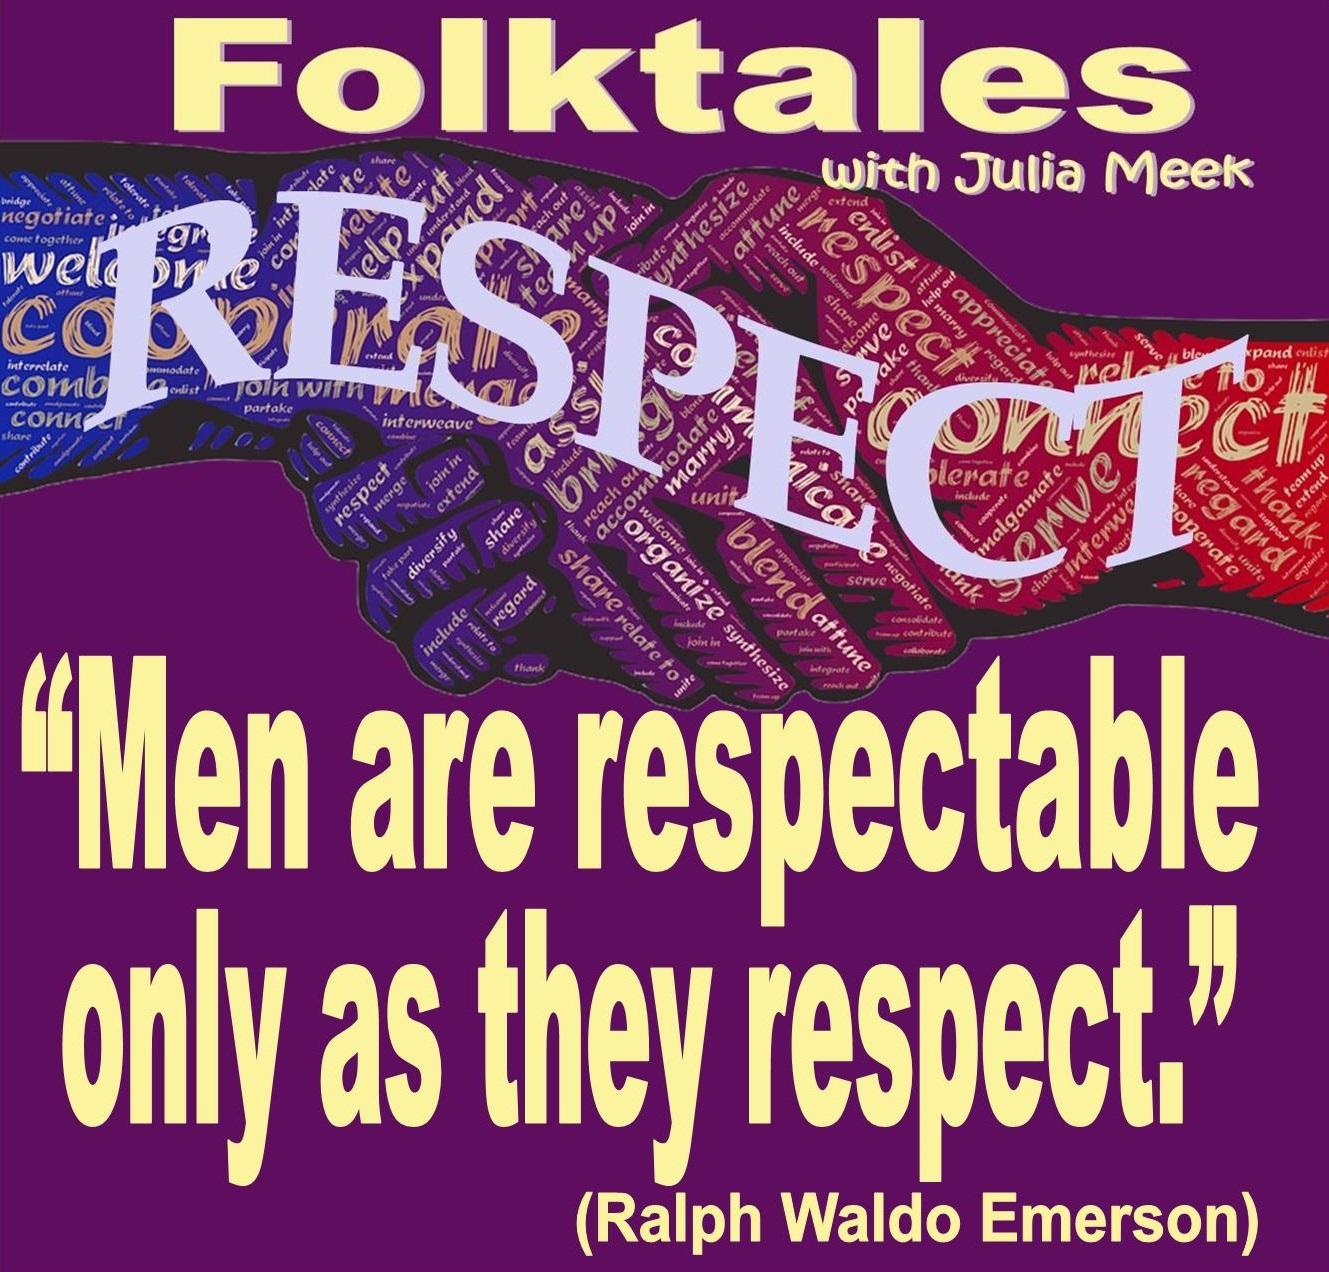 Caption: WBOI's Folktale of Respect, Credit: Julia Meek